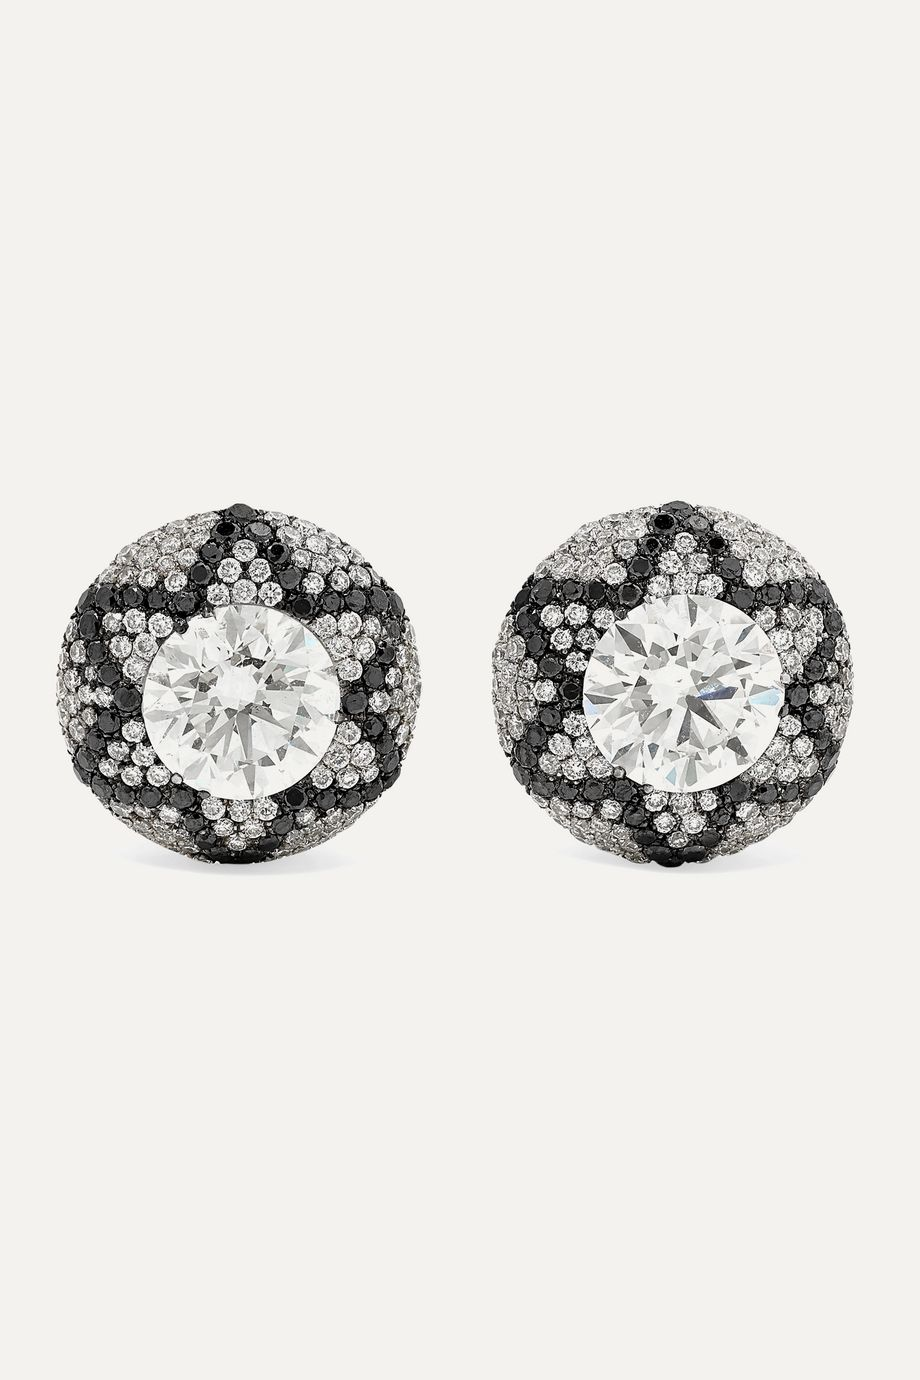 Martin Katz Starburst 18-karat white gold diamond earrings